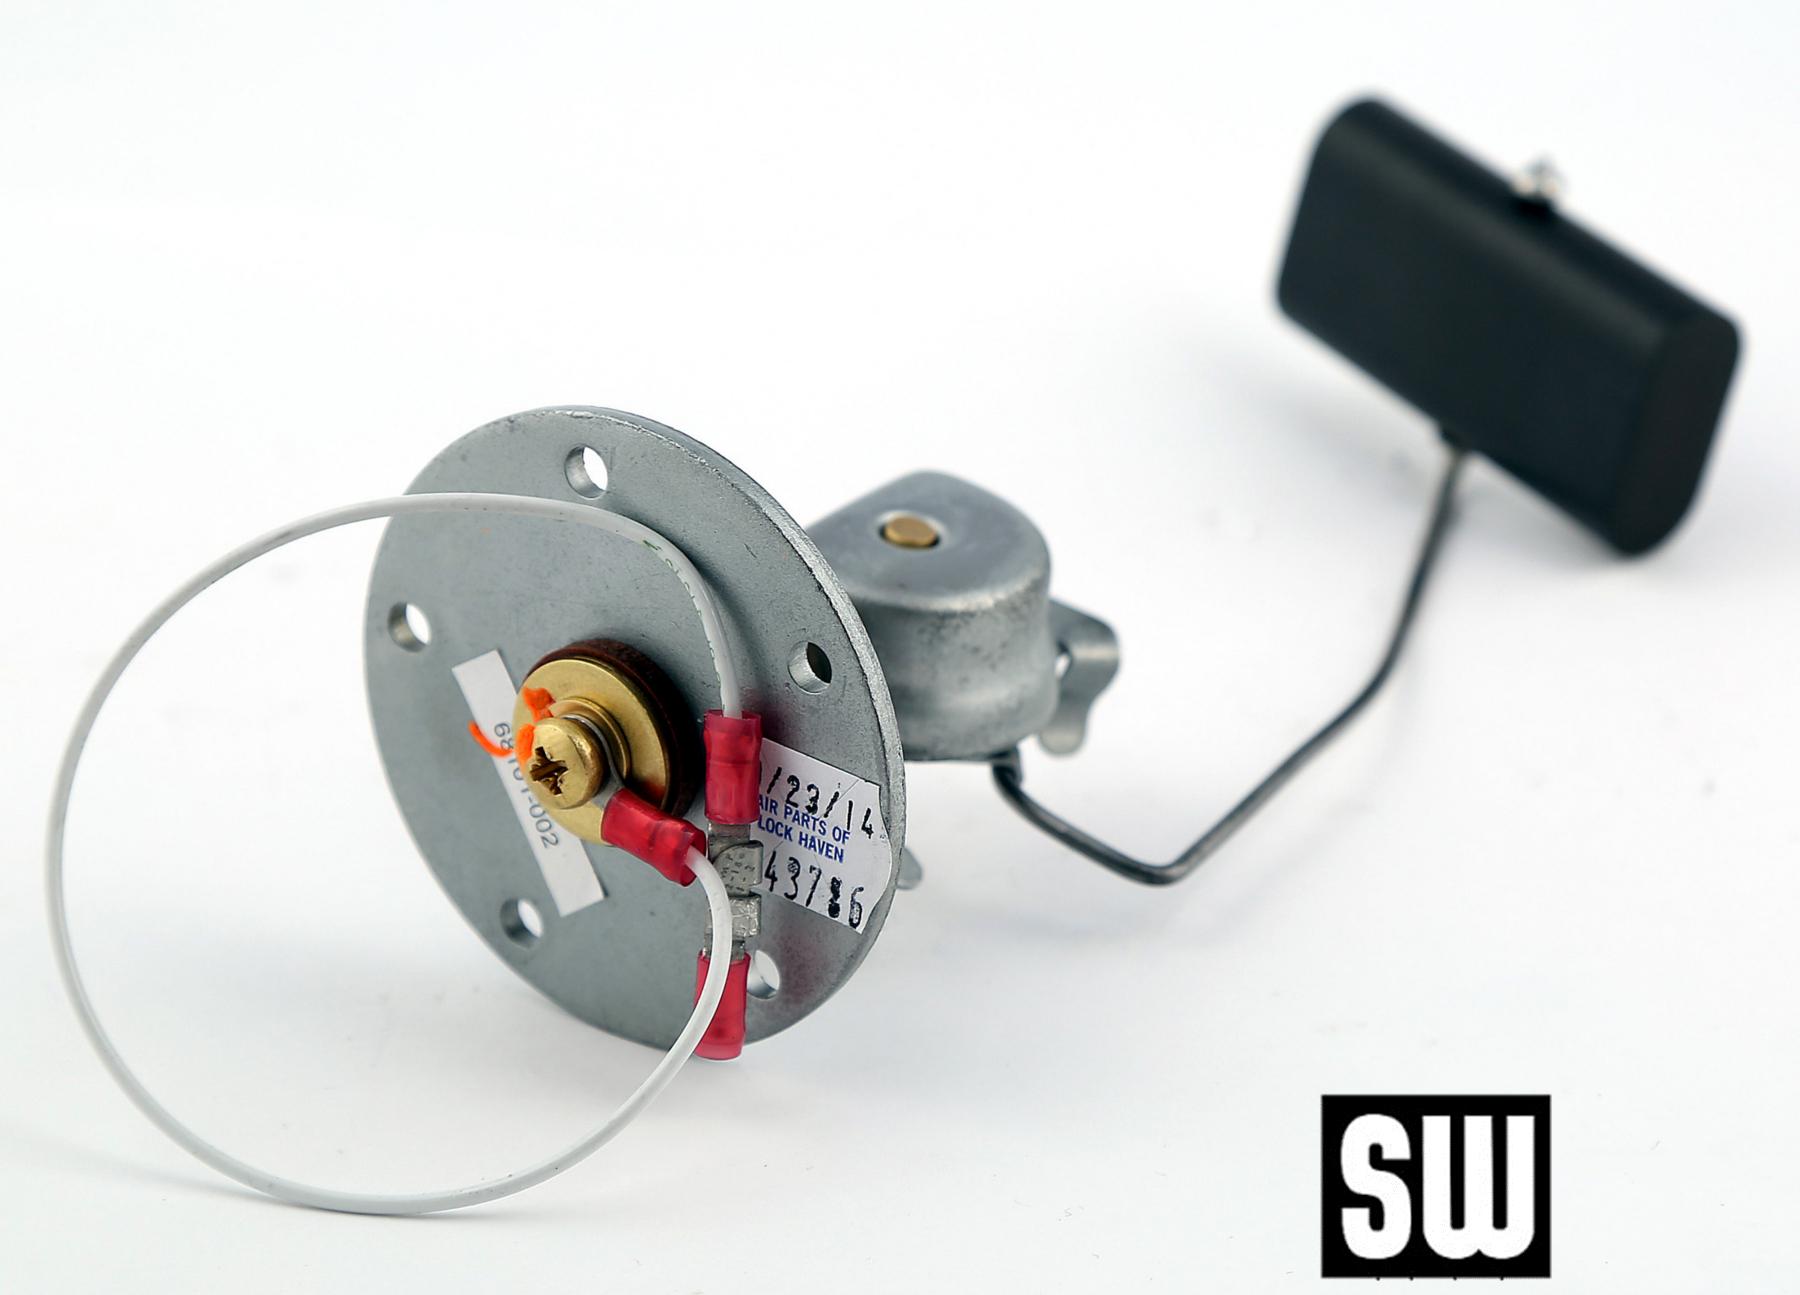 stewart warner volt gauge wiring diagram whelen 9m light bar wire gauges diagrams library 385c f r swing 6 12 fuel level sending unit 240 33 ohm best